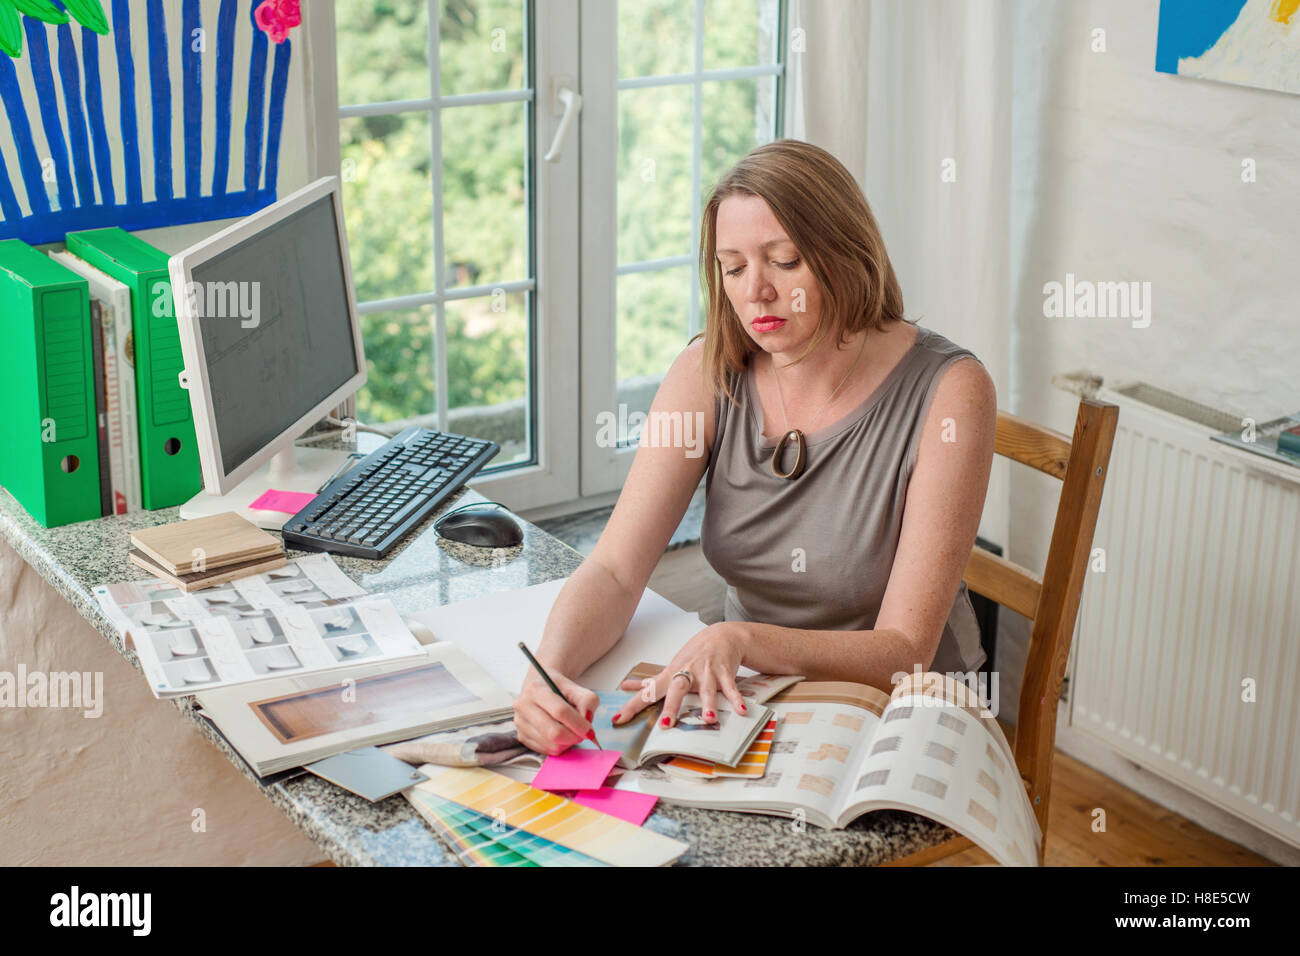 Joven trabajador moderno de oficina Imagen De Stock